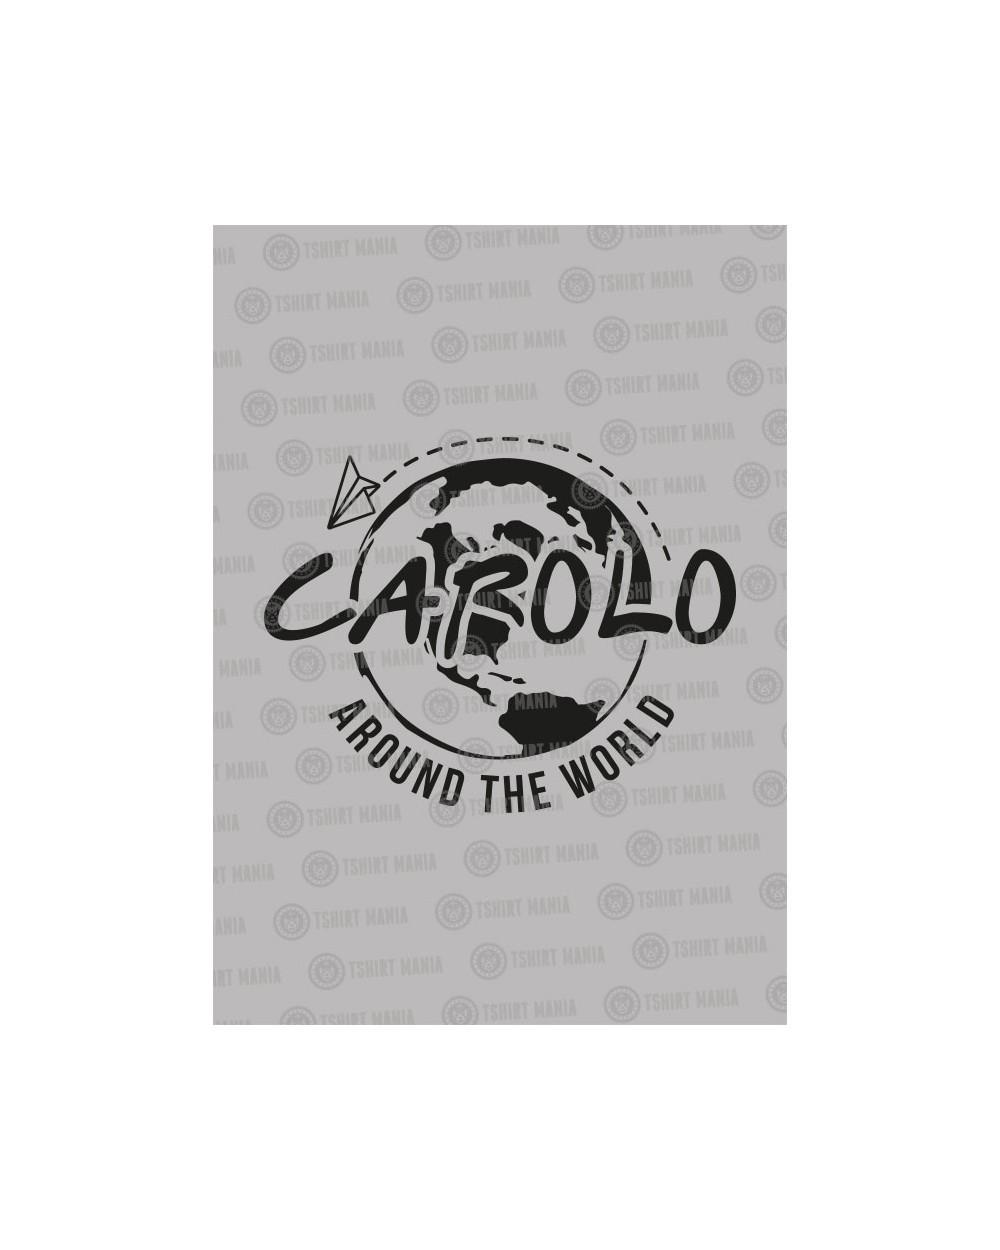 Carolo around the world Sweat